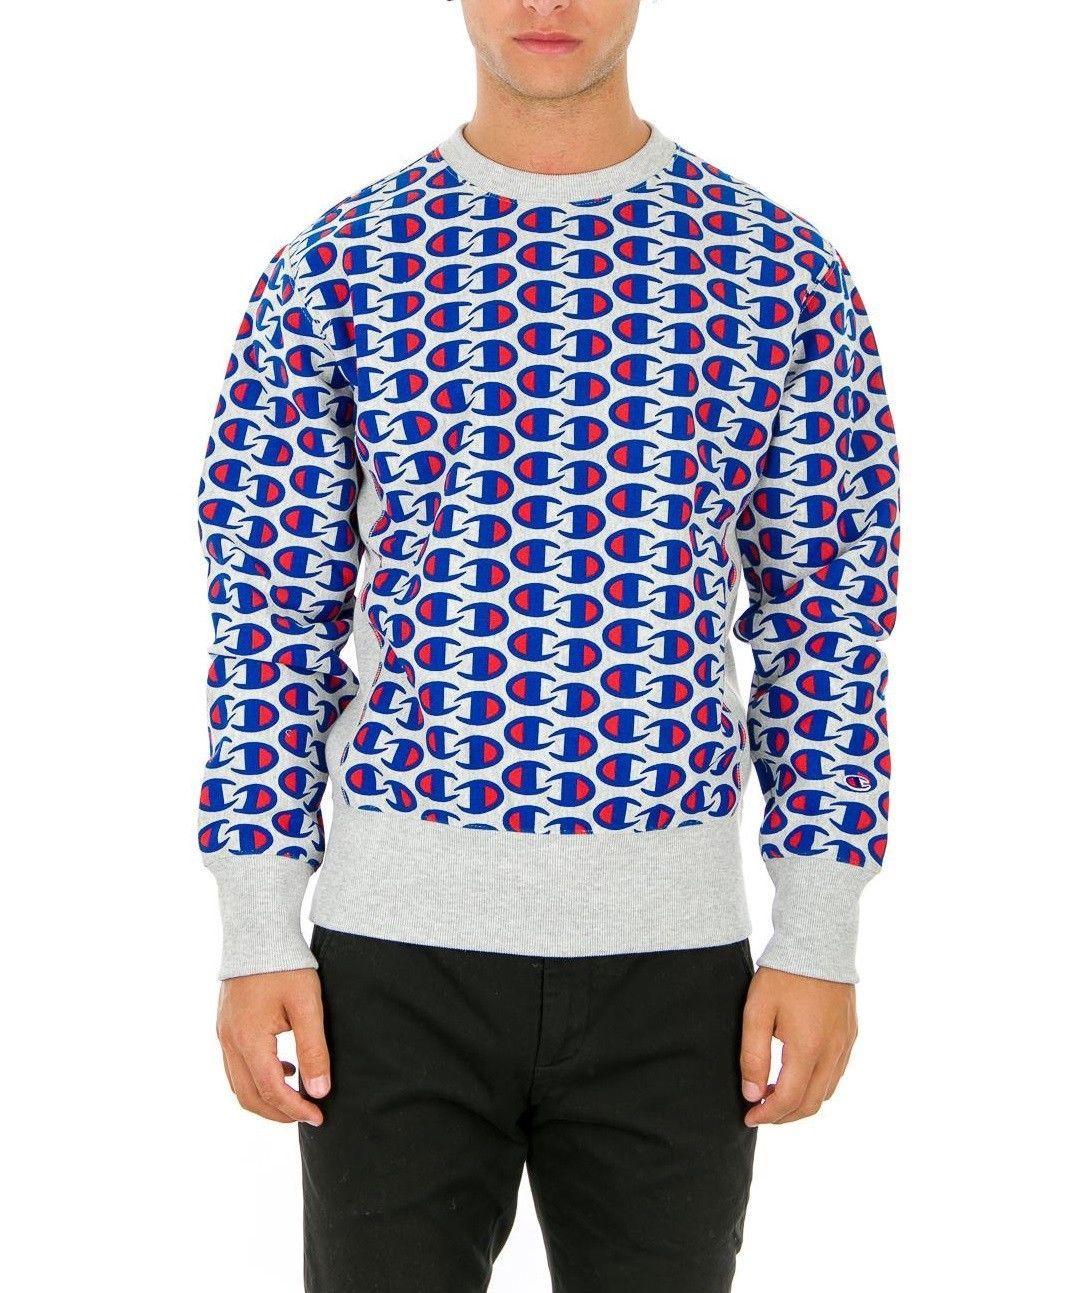 Sale Sweatshirt Champion 212429 Reverse Weave Man Round Neck Grey Blue Fleece Wi